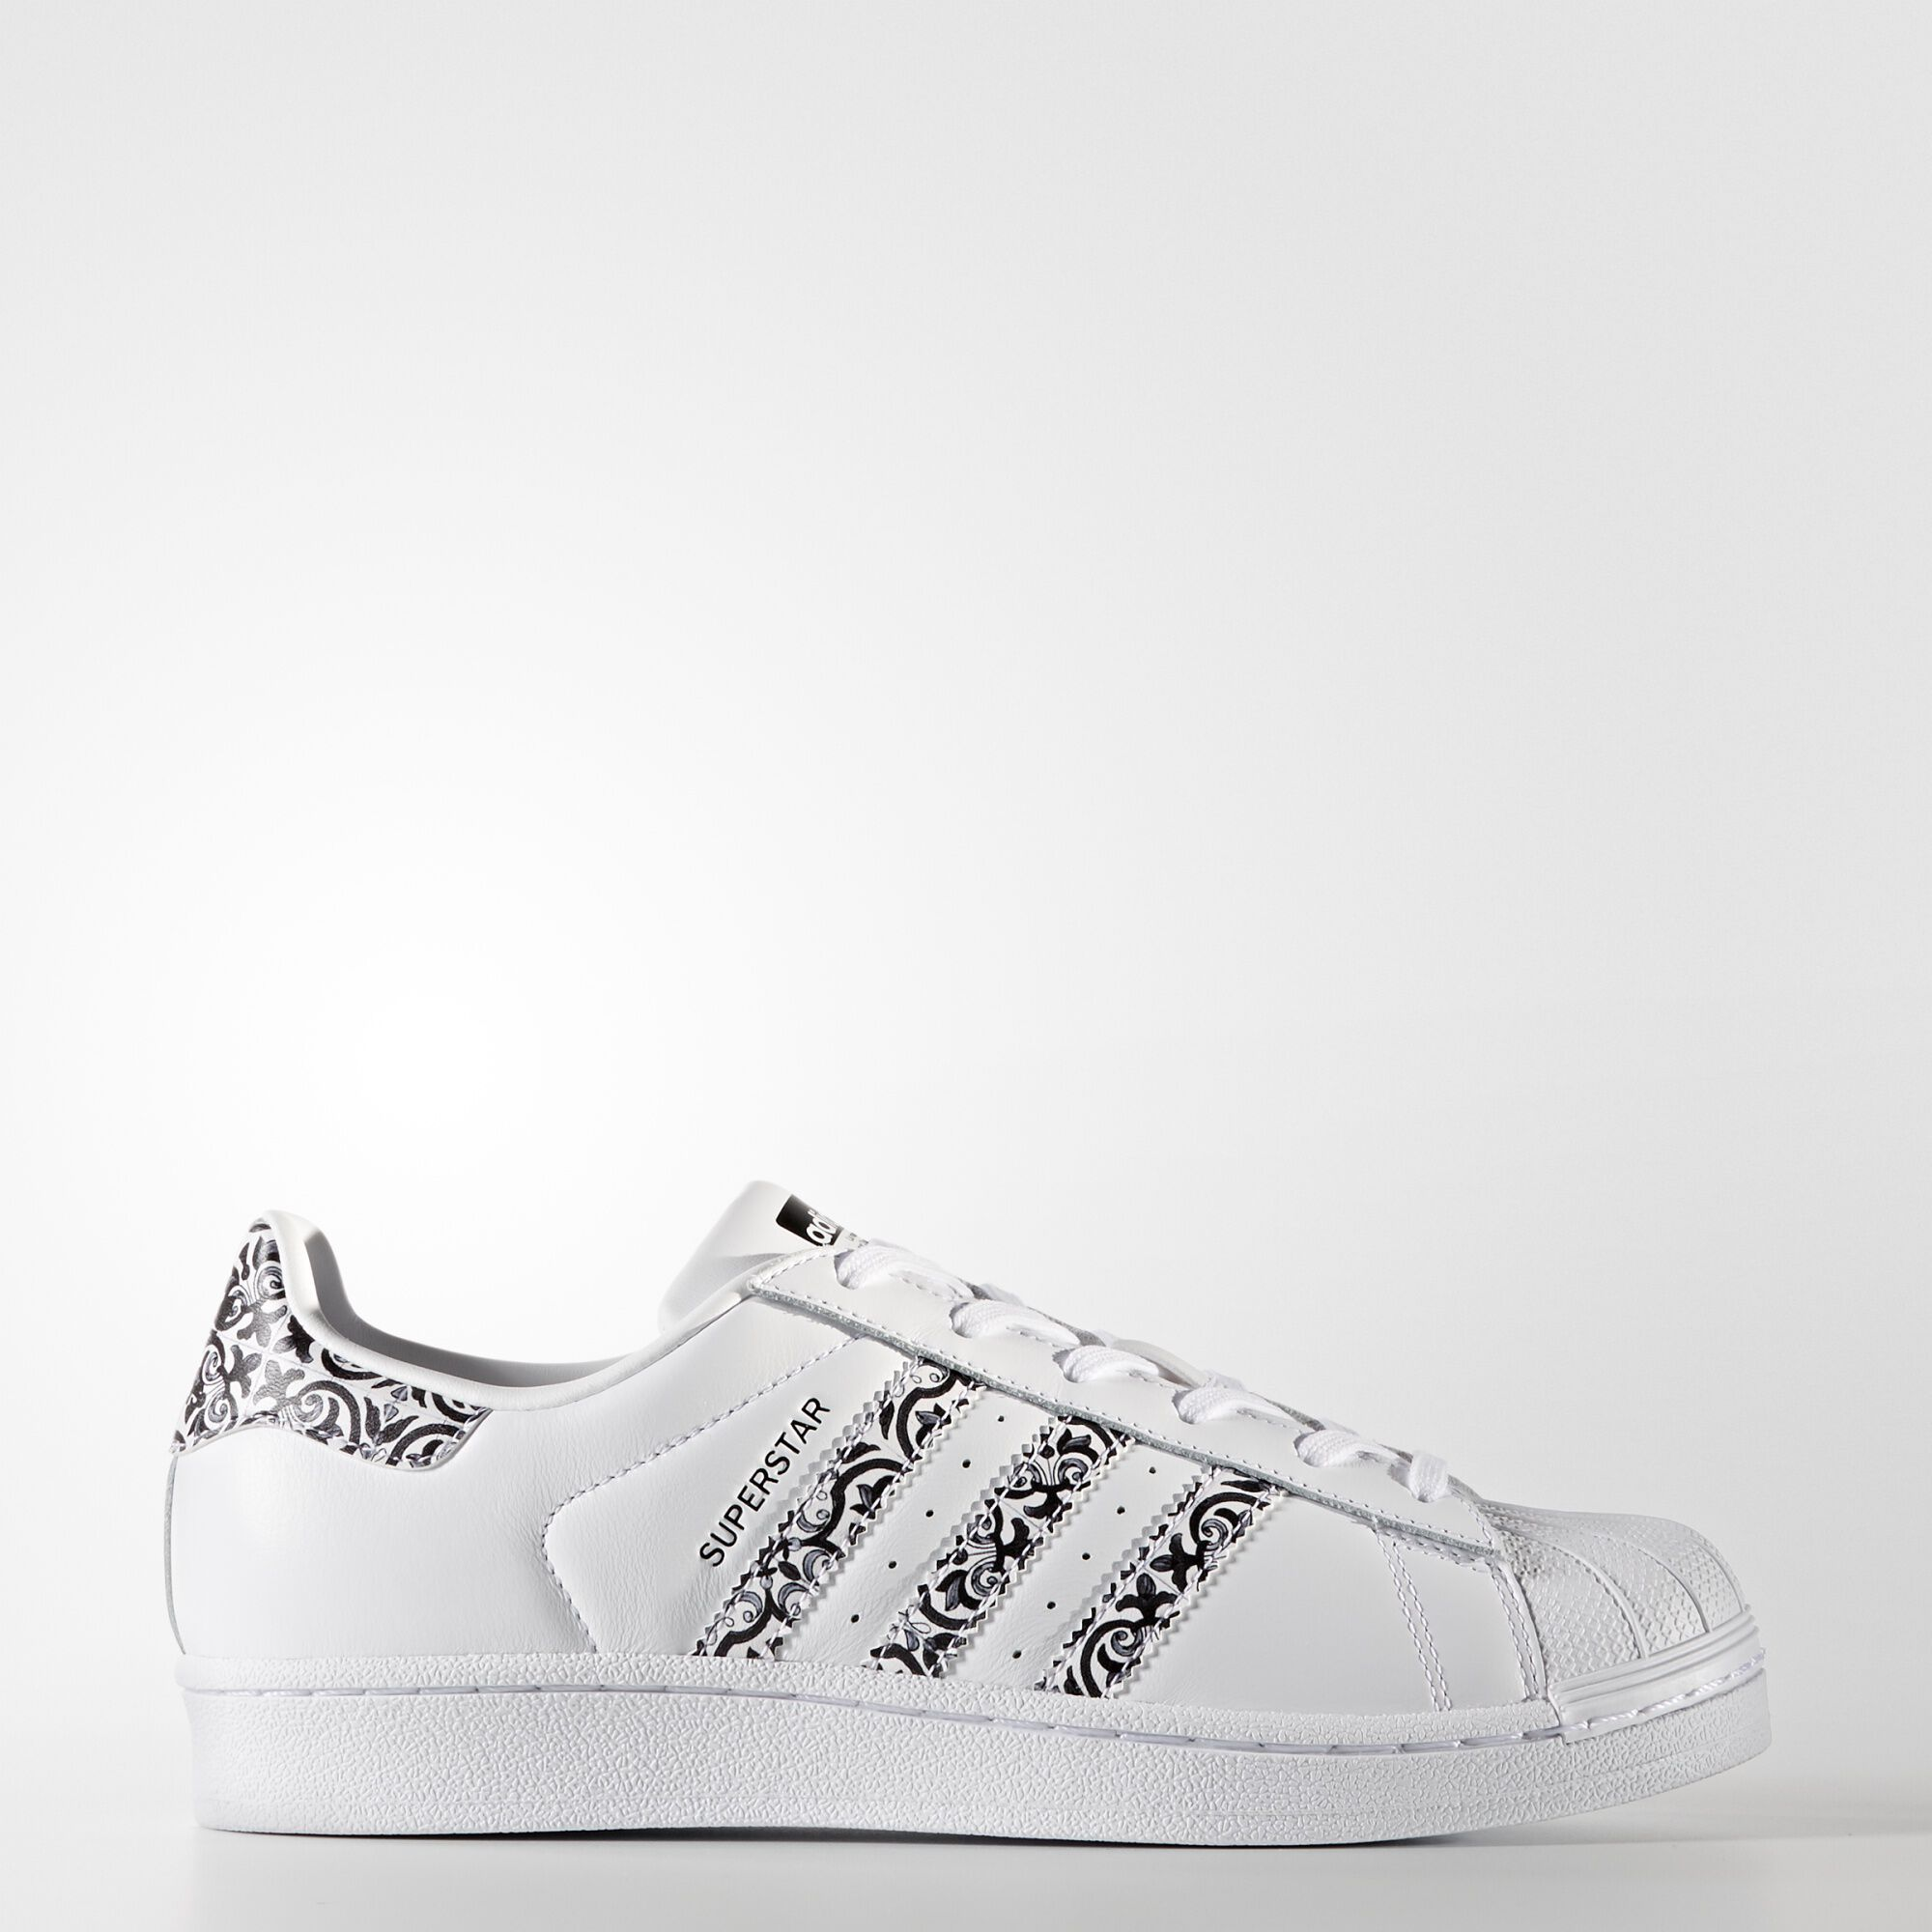 Adidas Superstar (Toddler) $44.99 Sneakerhead bb9076